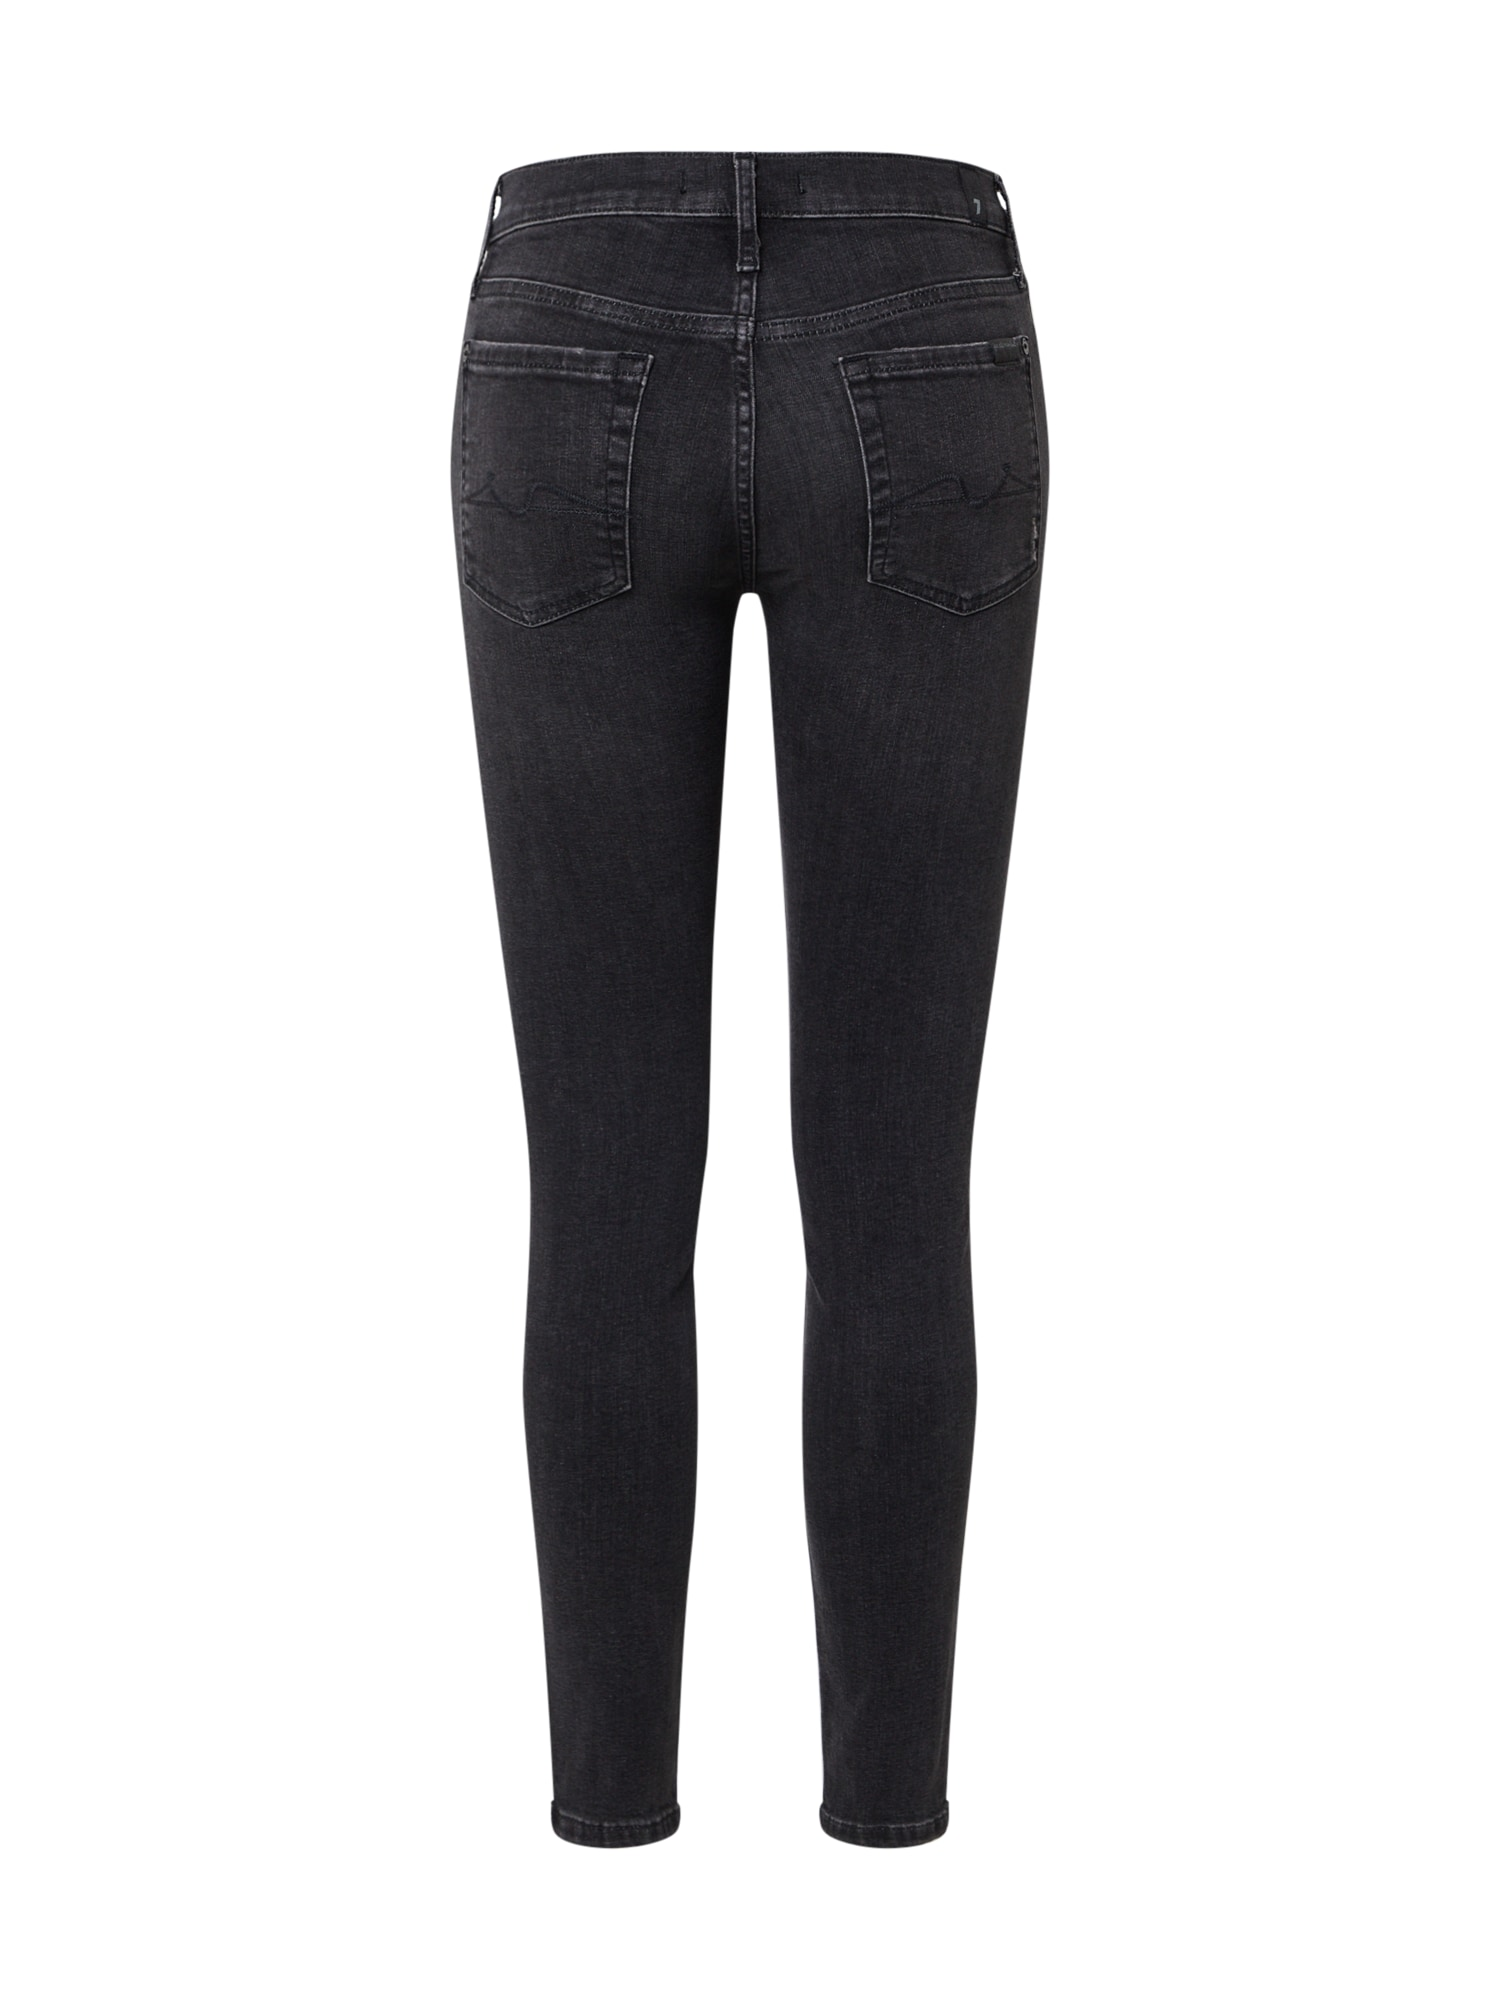 7 for all mankind Jeans  svart denim